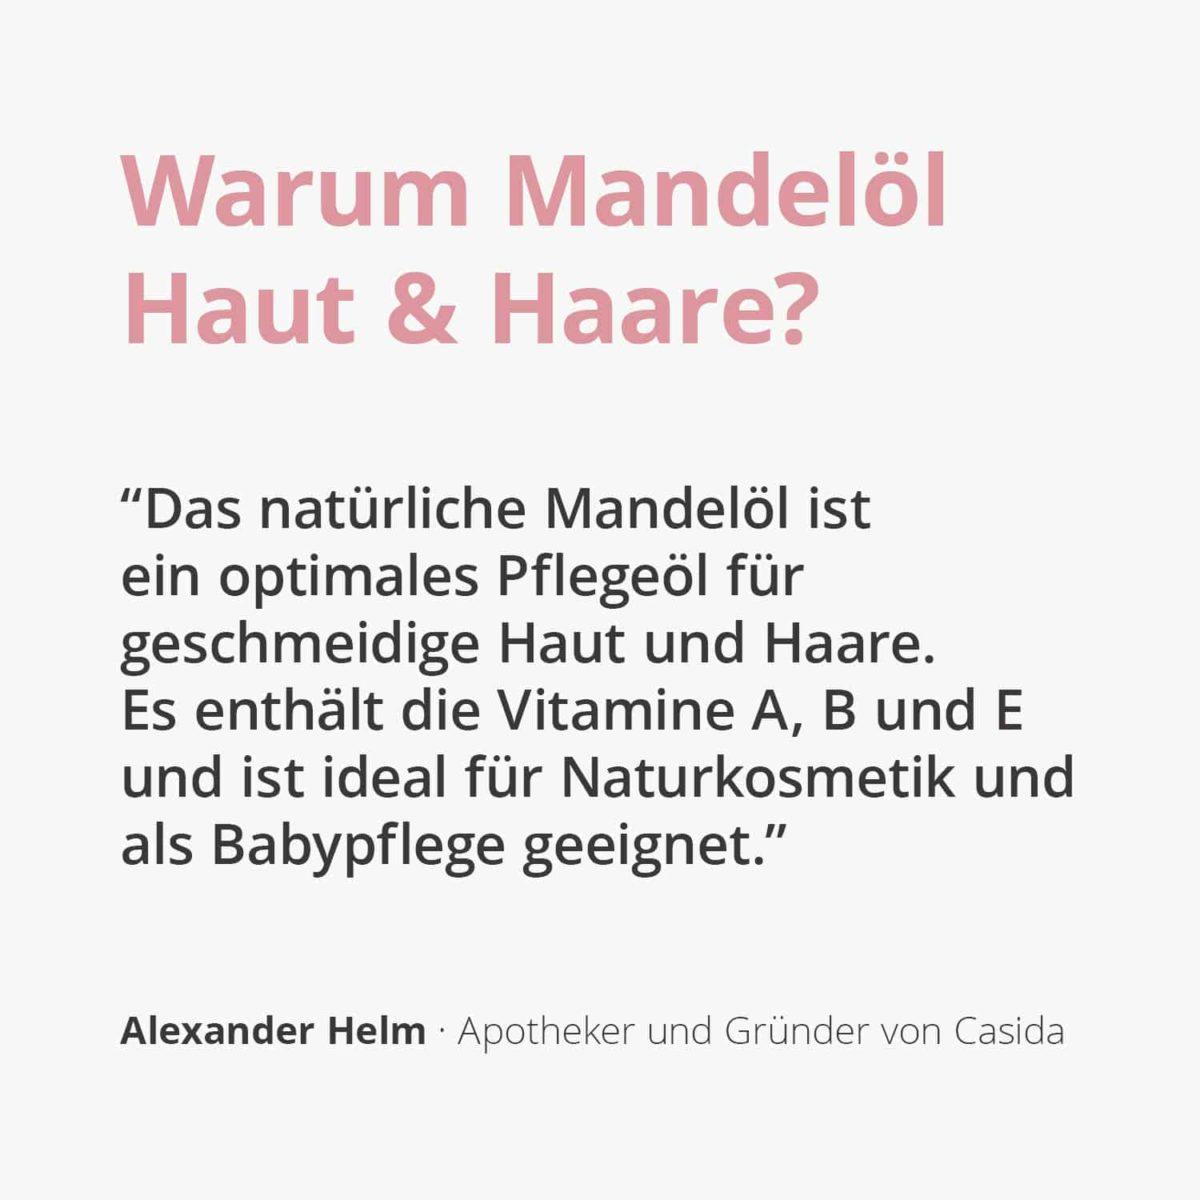 Casida Almond Oil for Skin & Hair – 200 ml 16813099 PZN Apotheke Mandelöl Babypflege trockene Haut pflegen natürlich2